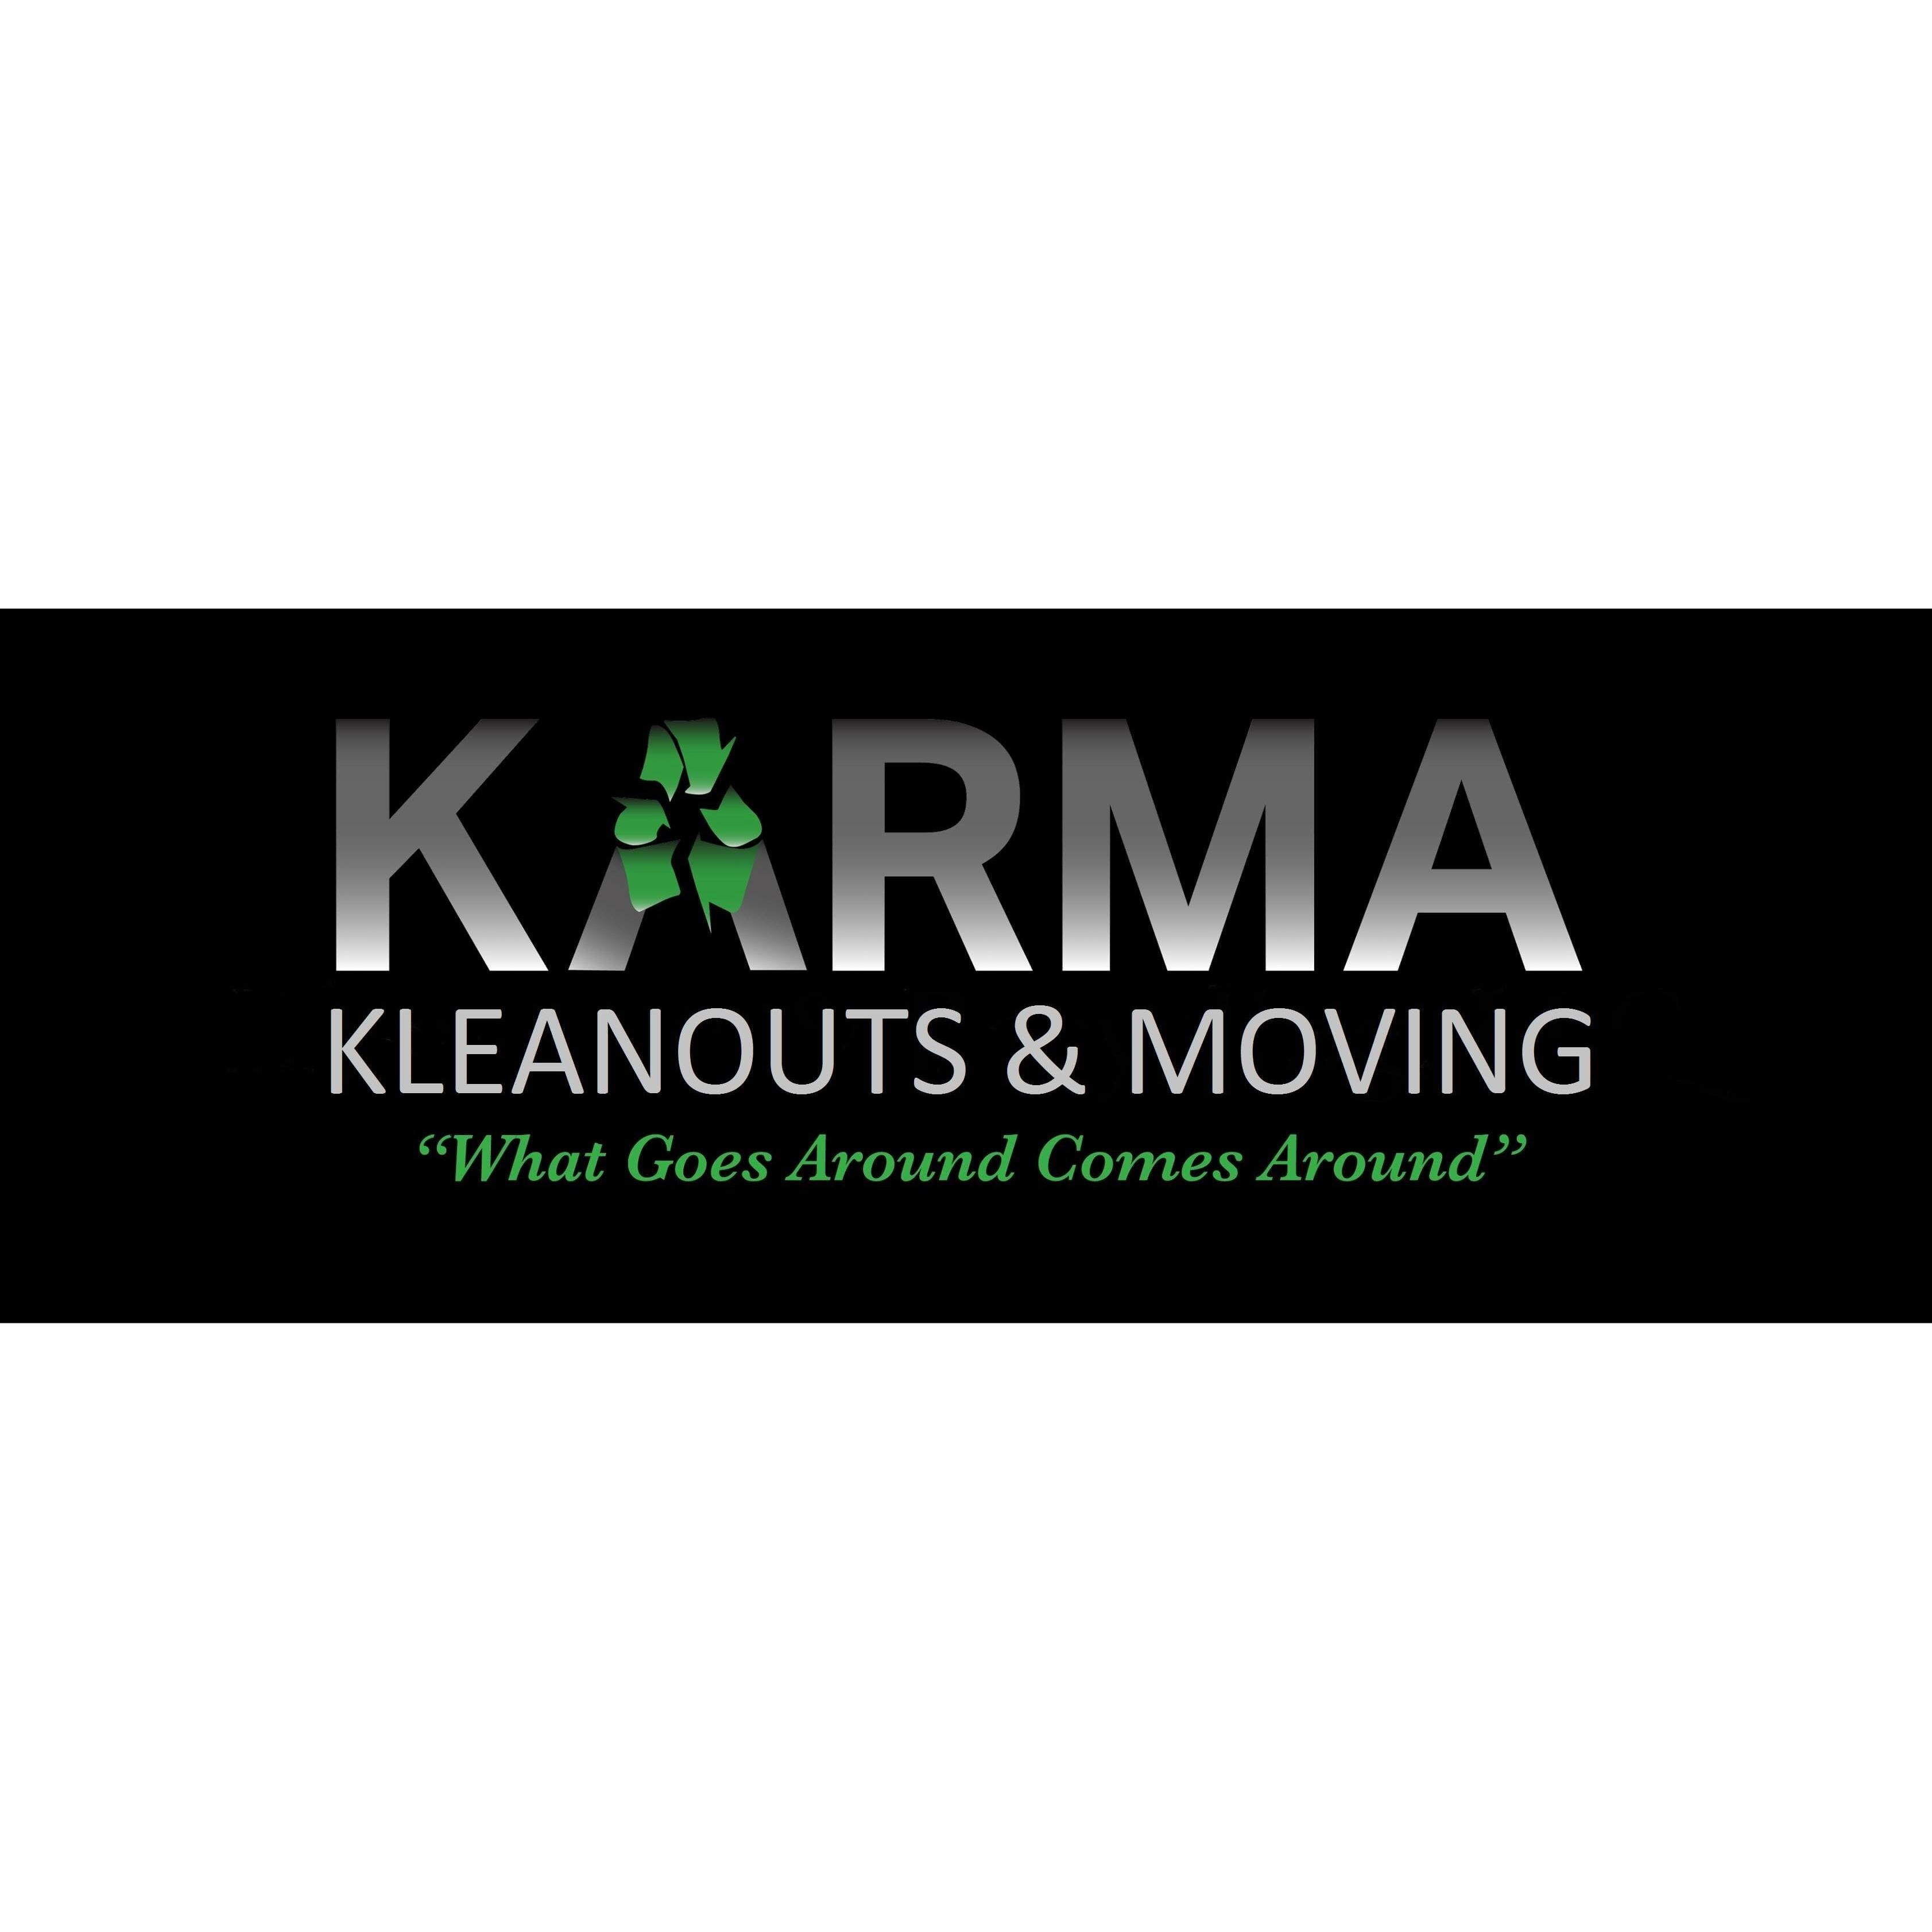 Karma Kleanouts & Moving - Philadelphia, PA - Debris & Waste Removal